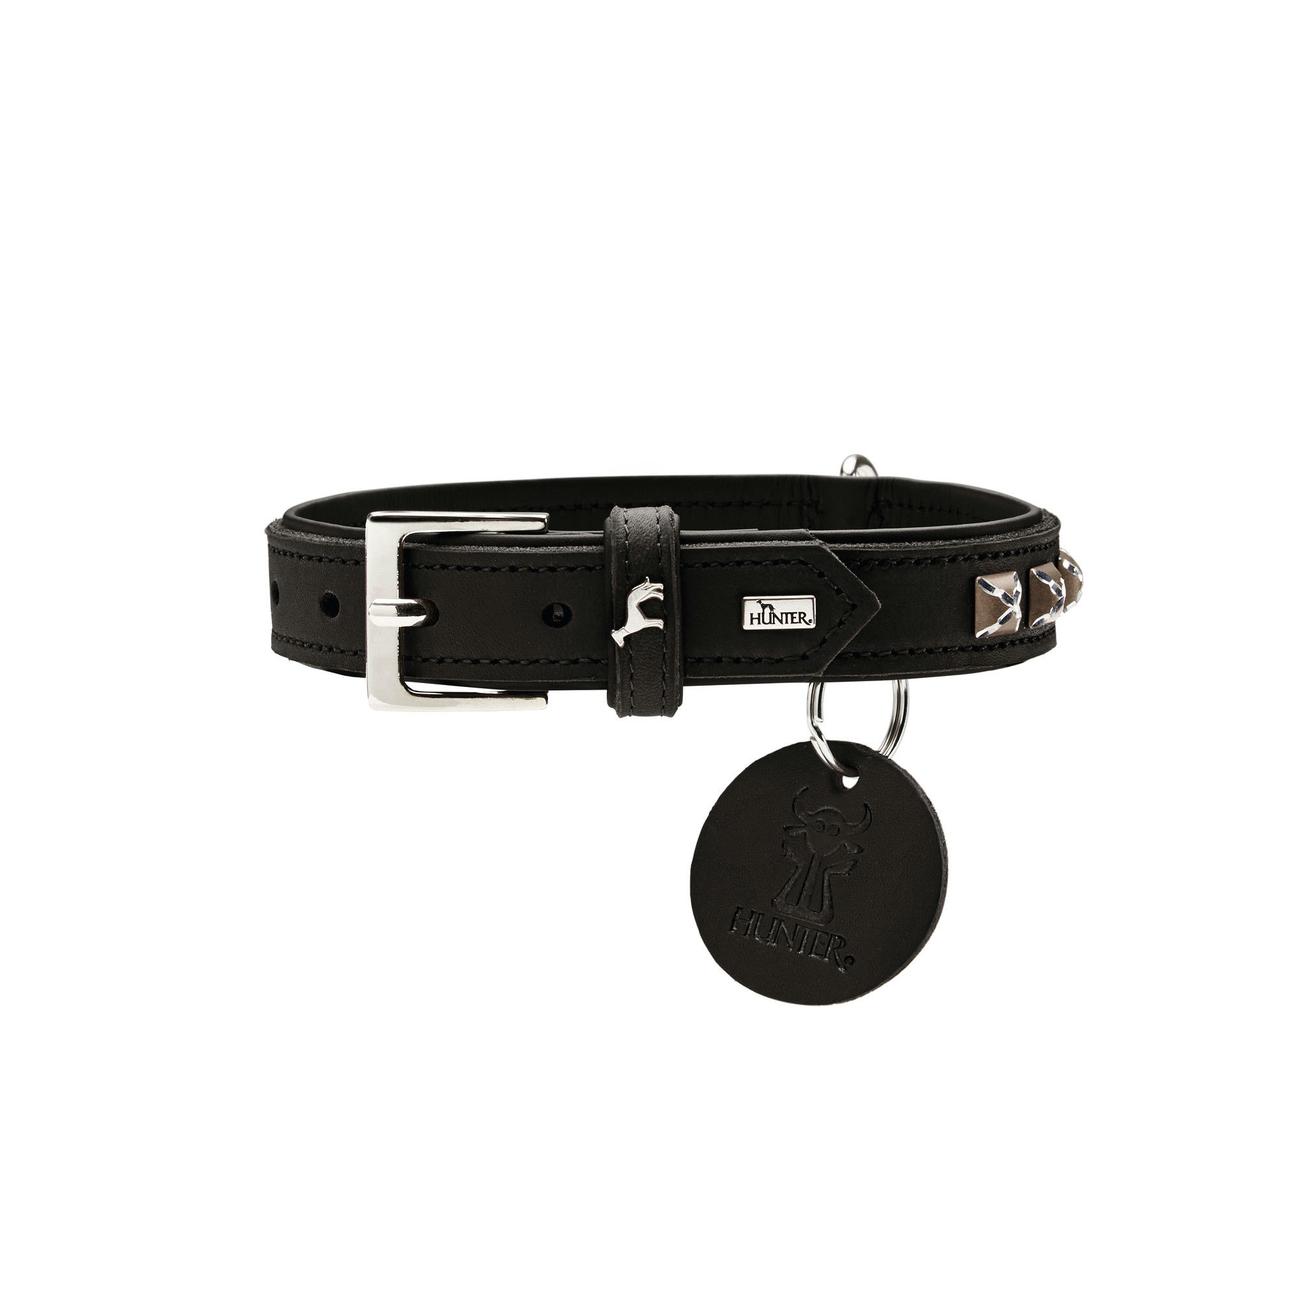 Hunter Leder Halsband Larvik Style 66172, Bild 6